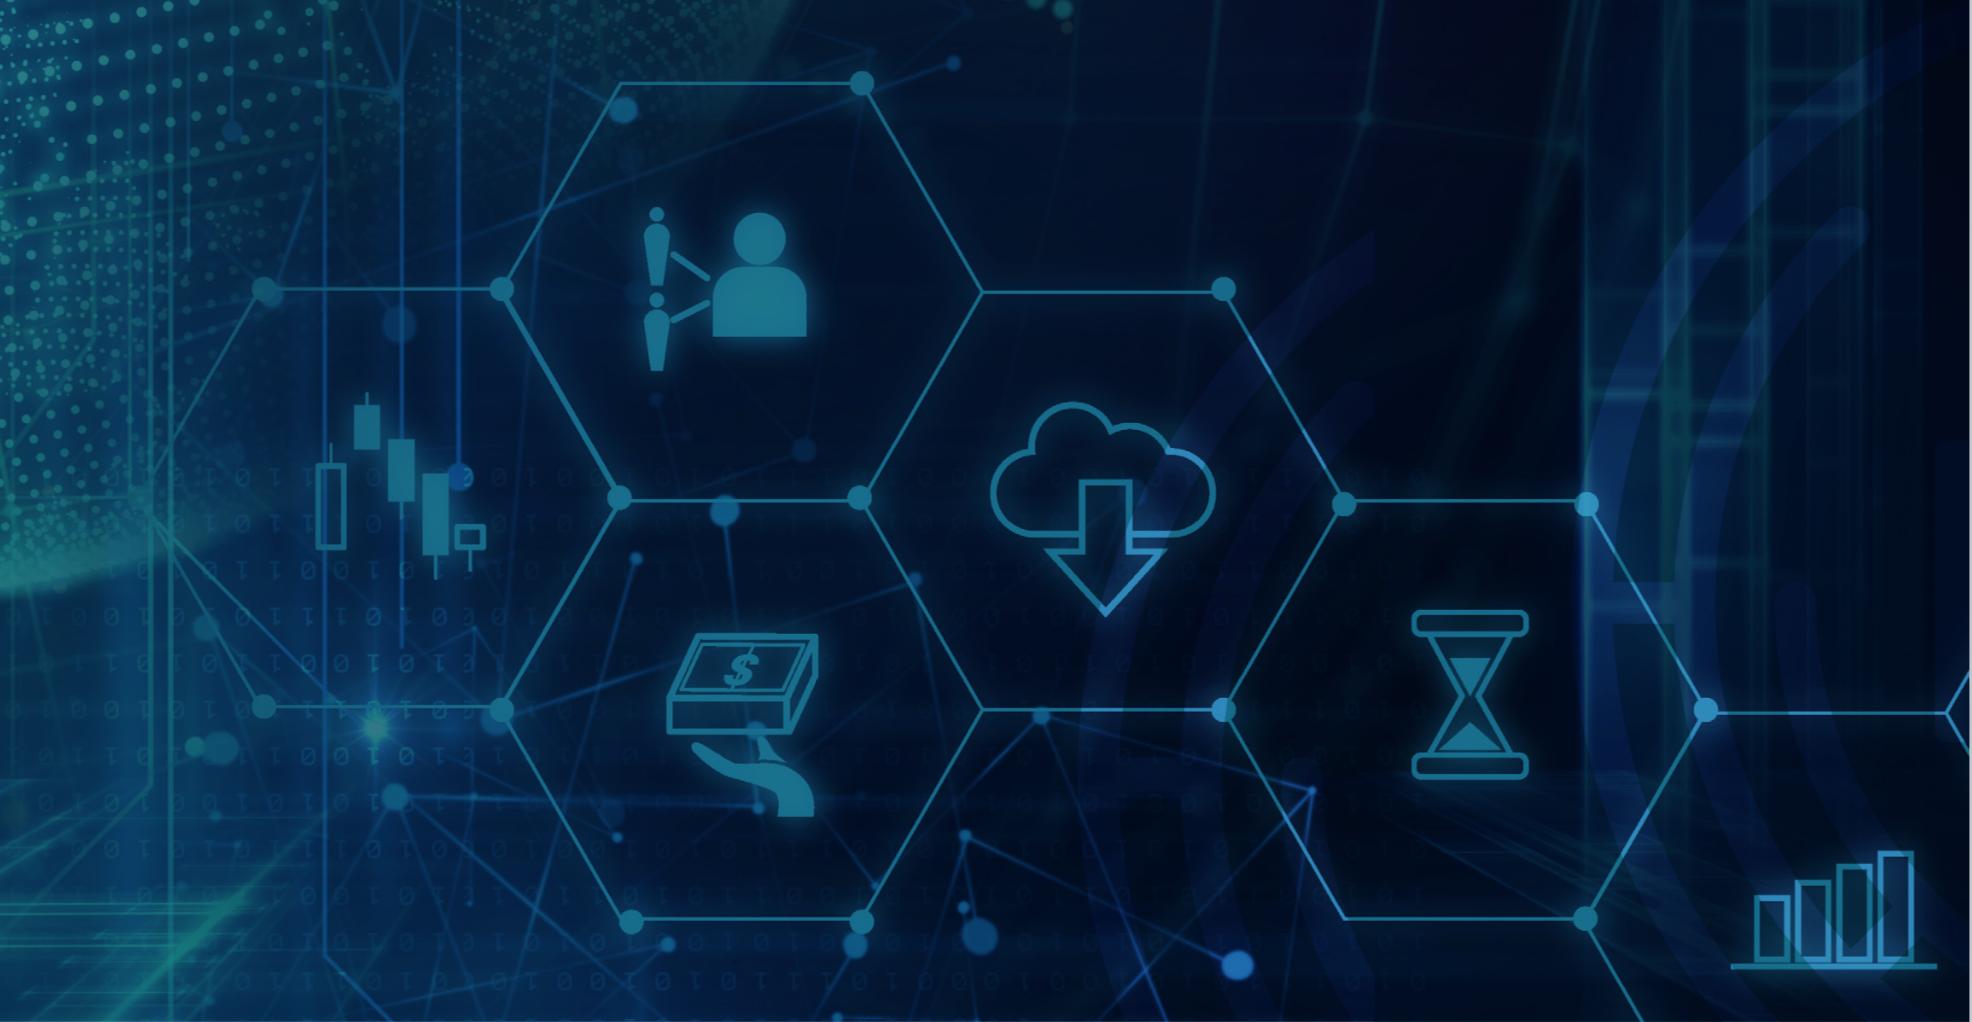 A New Market Emerges to ConnectFintechVendors and Regulators   Visit the Vendor Database